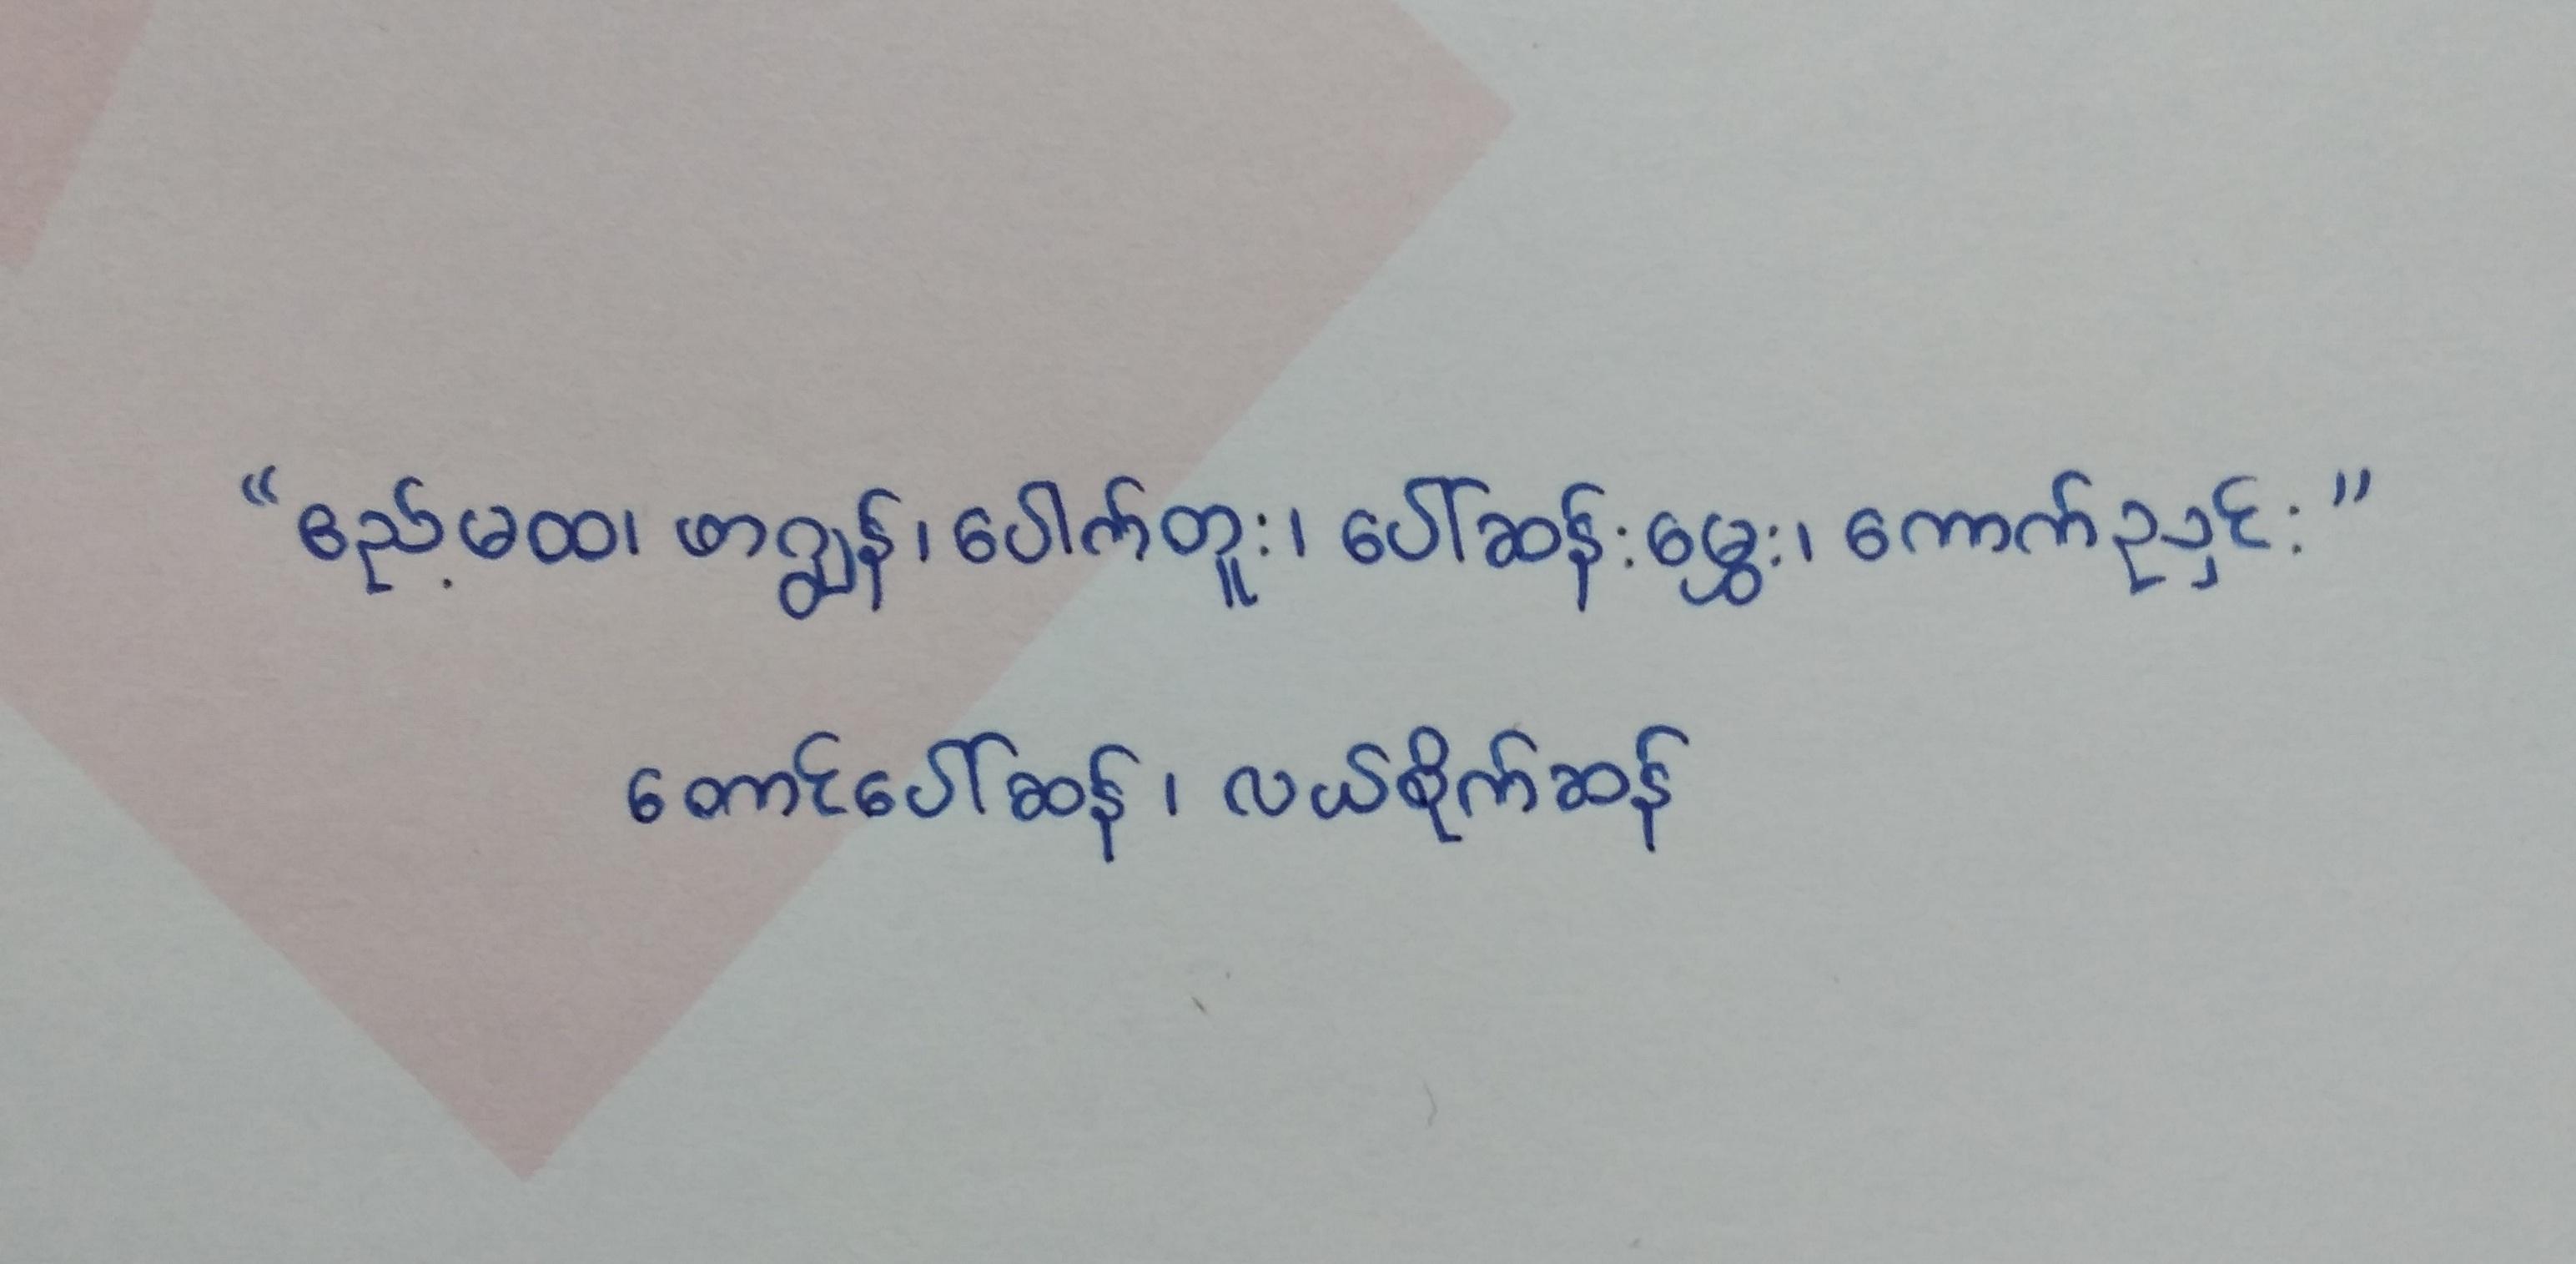 Rice names in Burmese